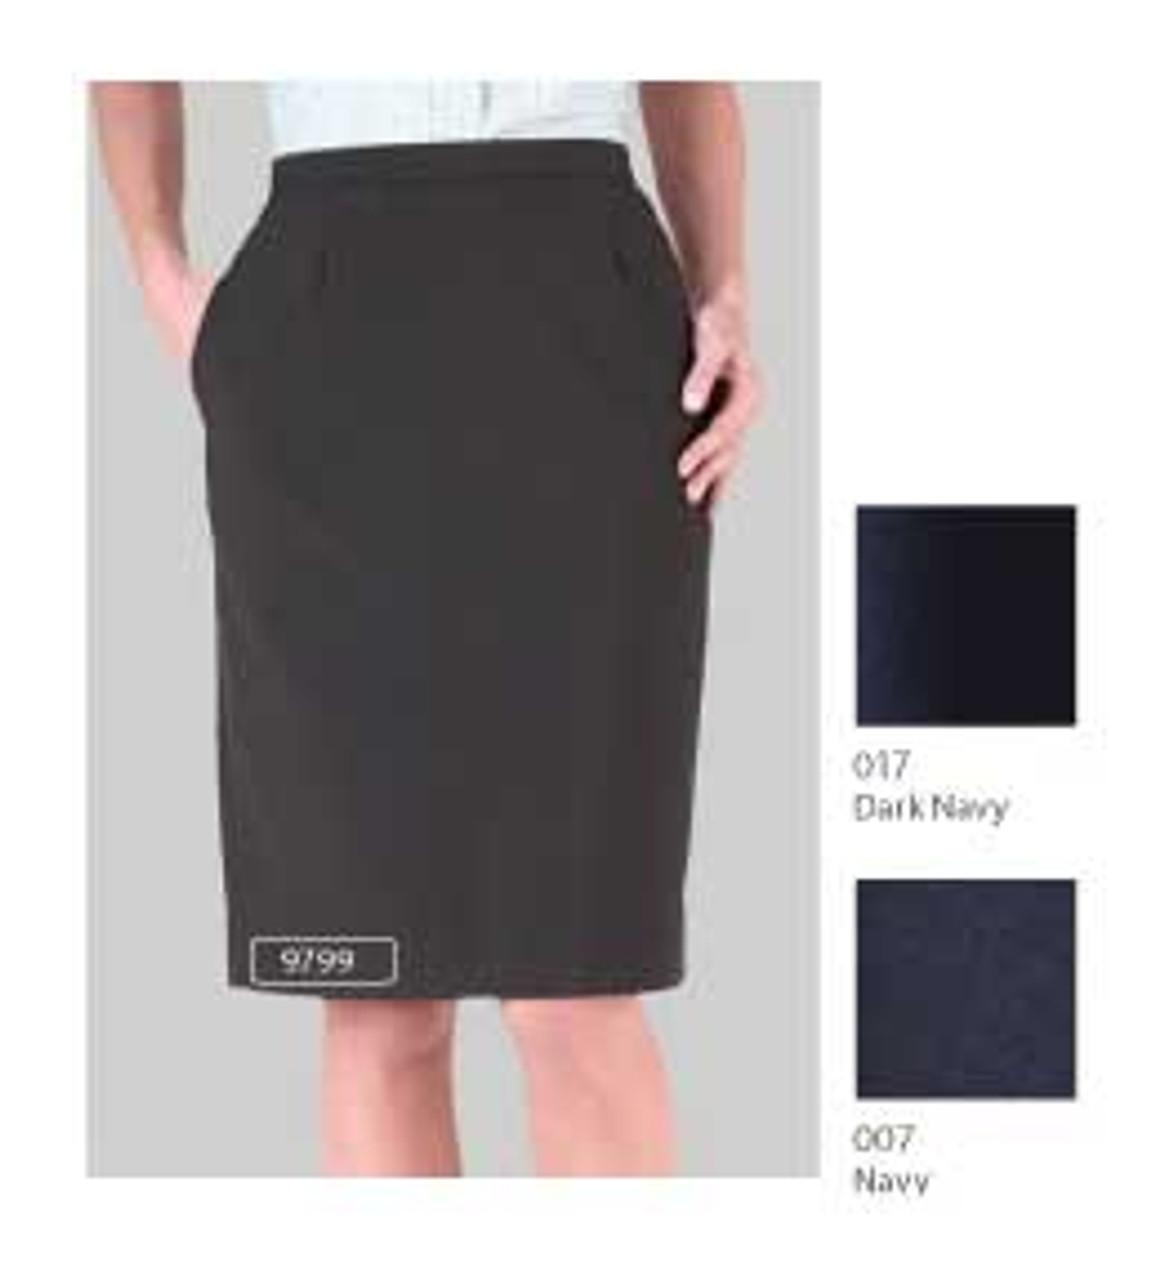 Knee-length uniform skirt for offices or front desk ladies